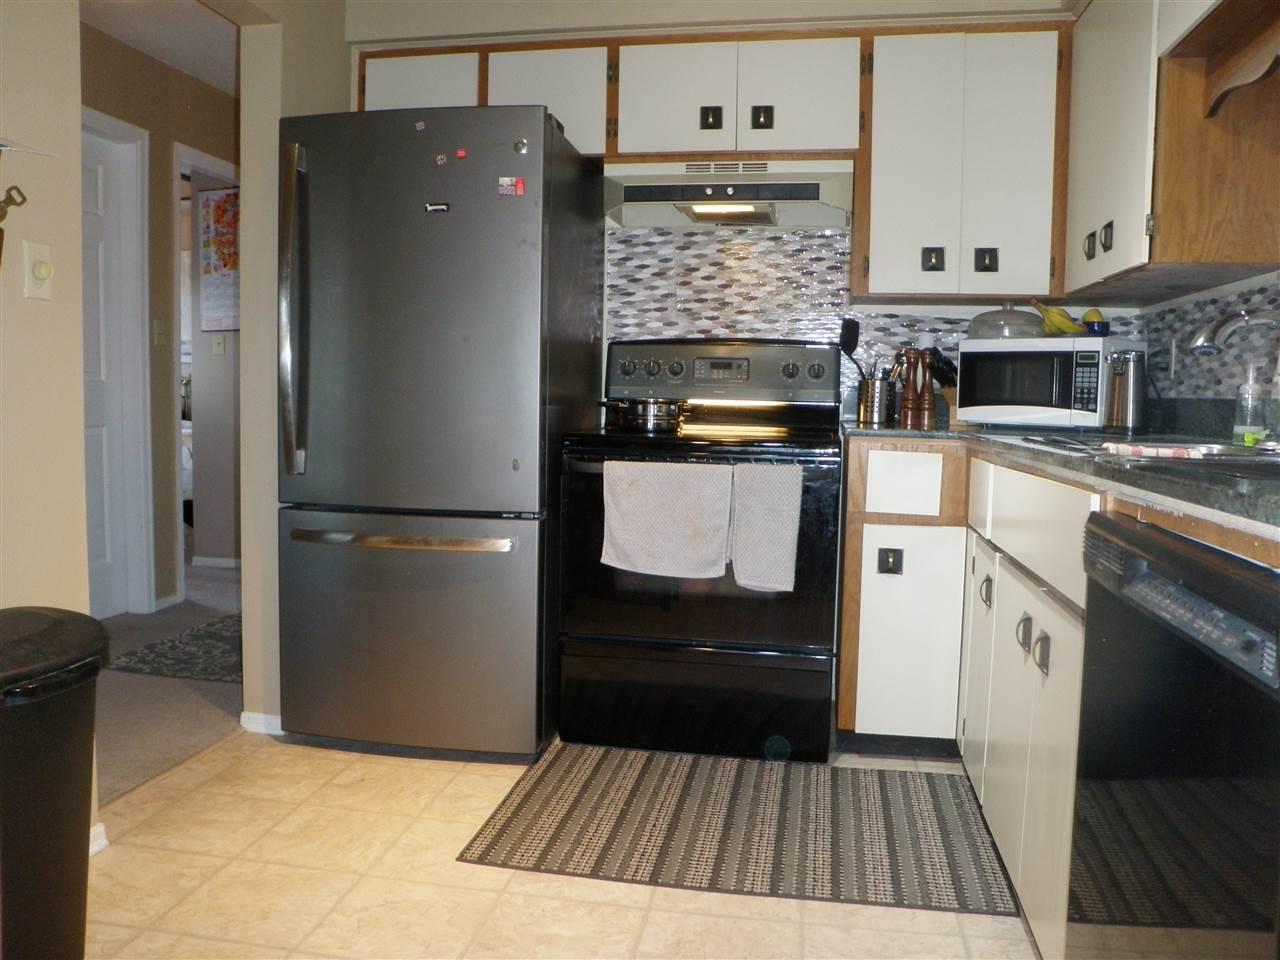 Condo Apartment at 306 32885 GEORGE FERGUSON WAY, Unit 306, Abbotsford, British Columbia. Image 9